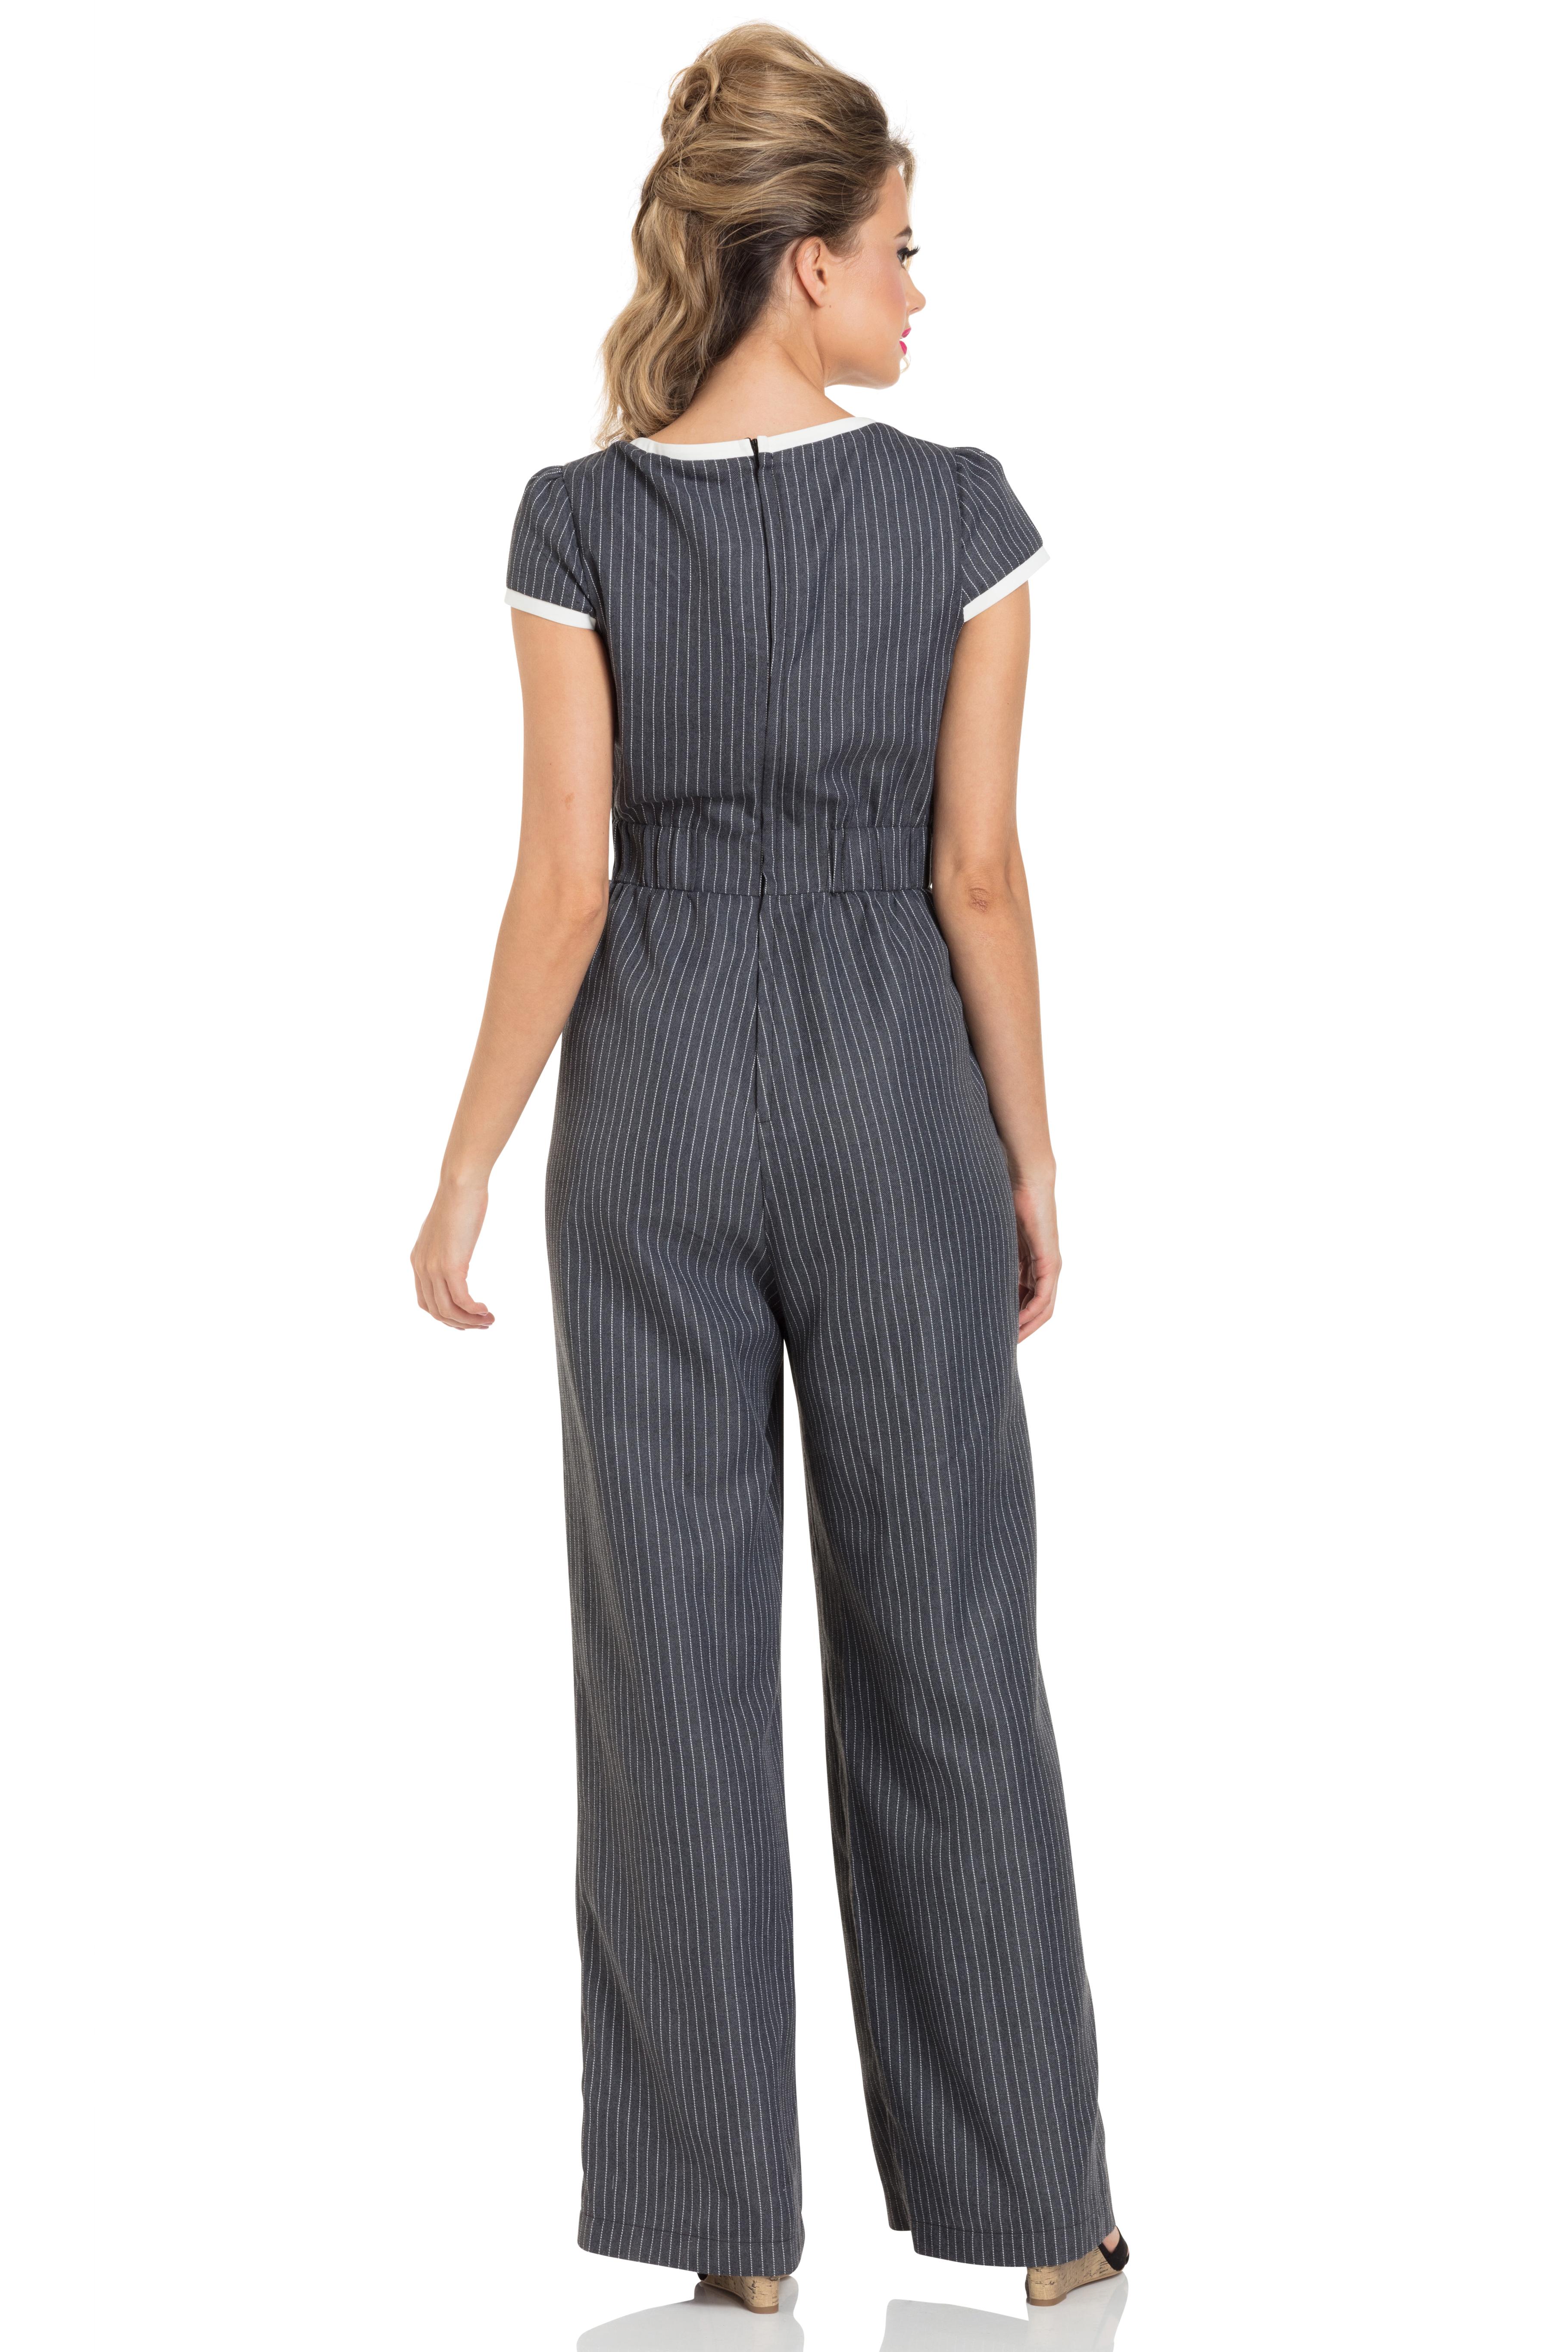 Leanne Grey Striped Jumpsuit